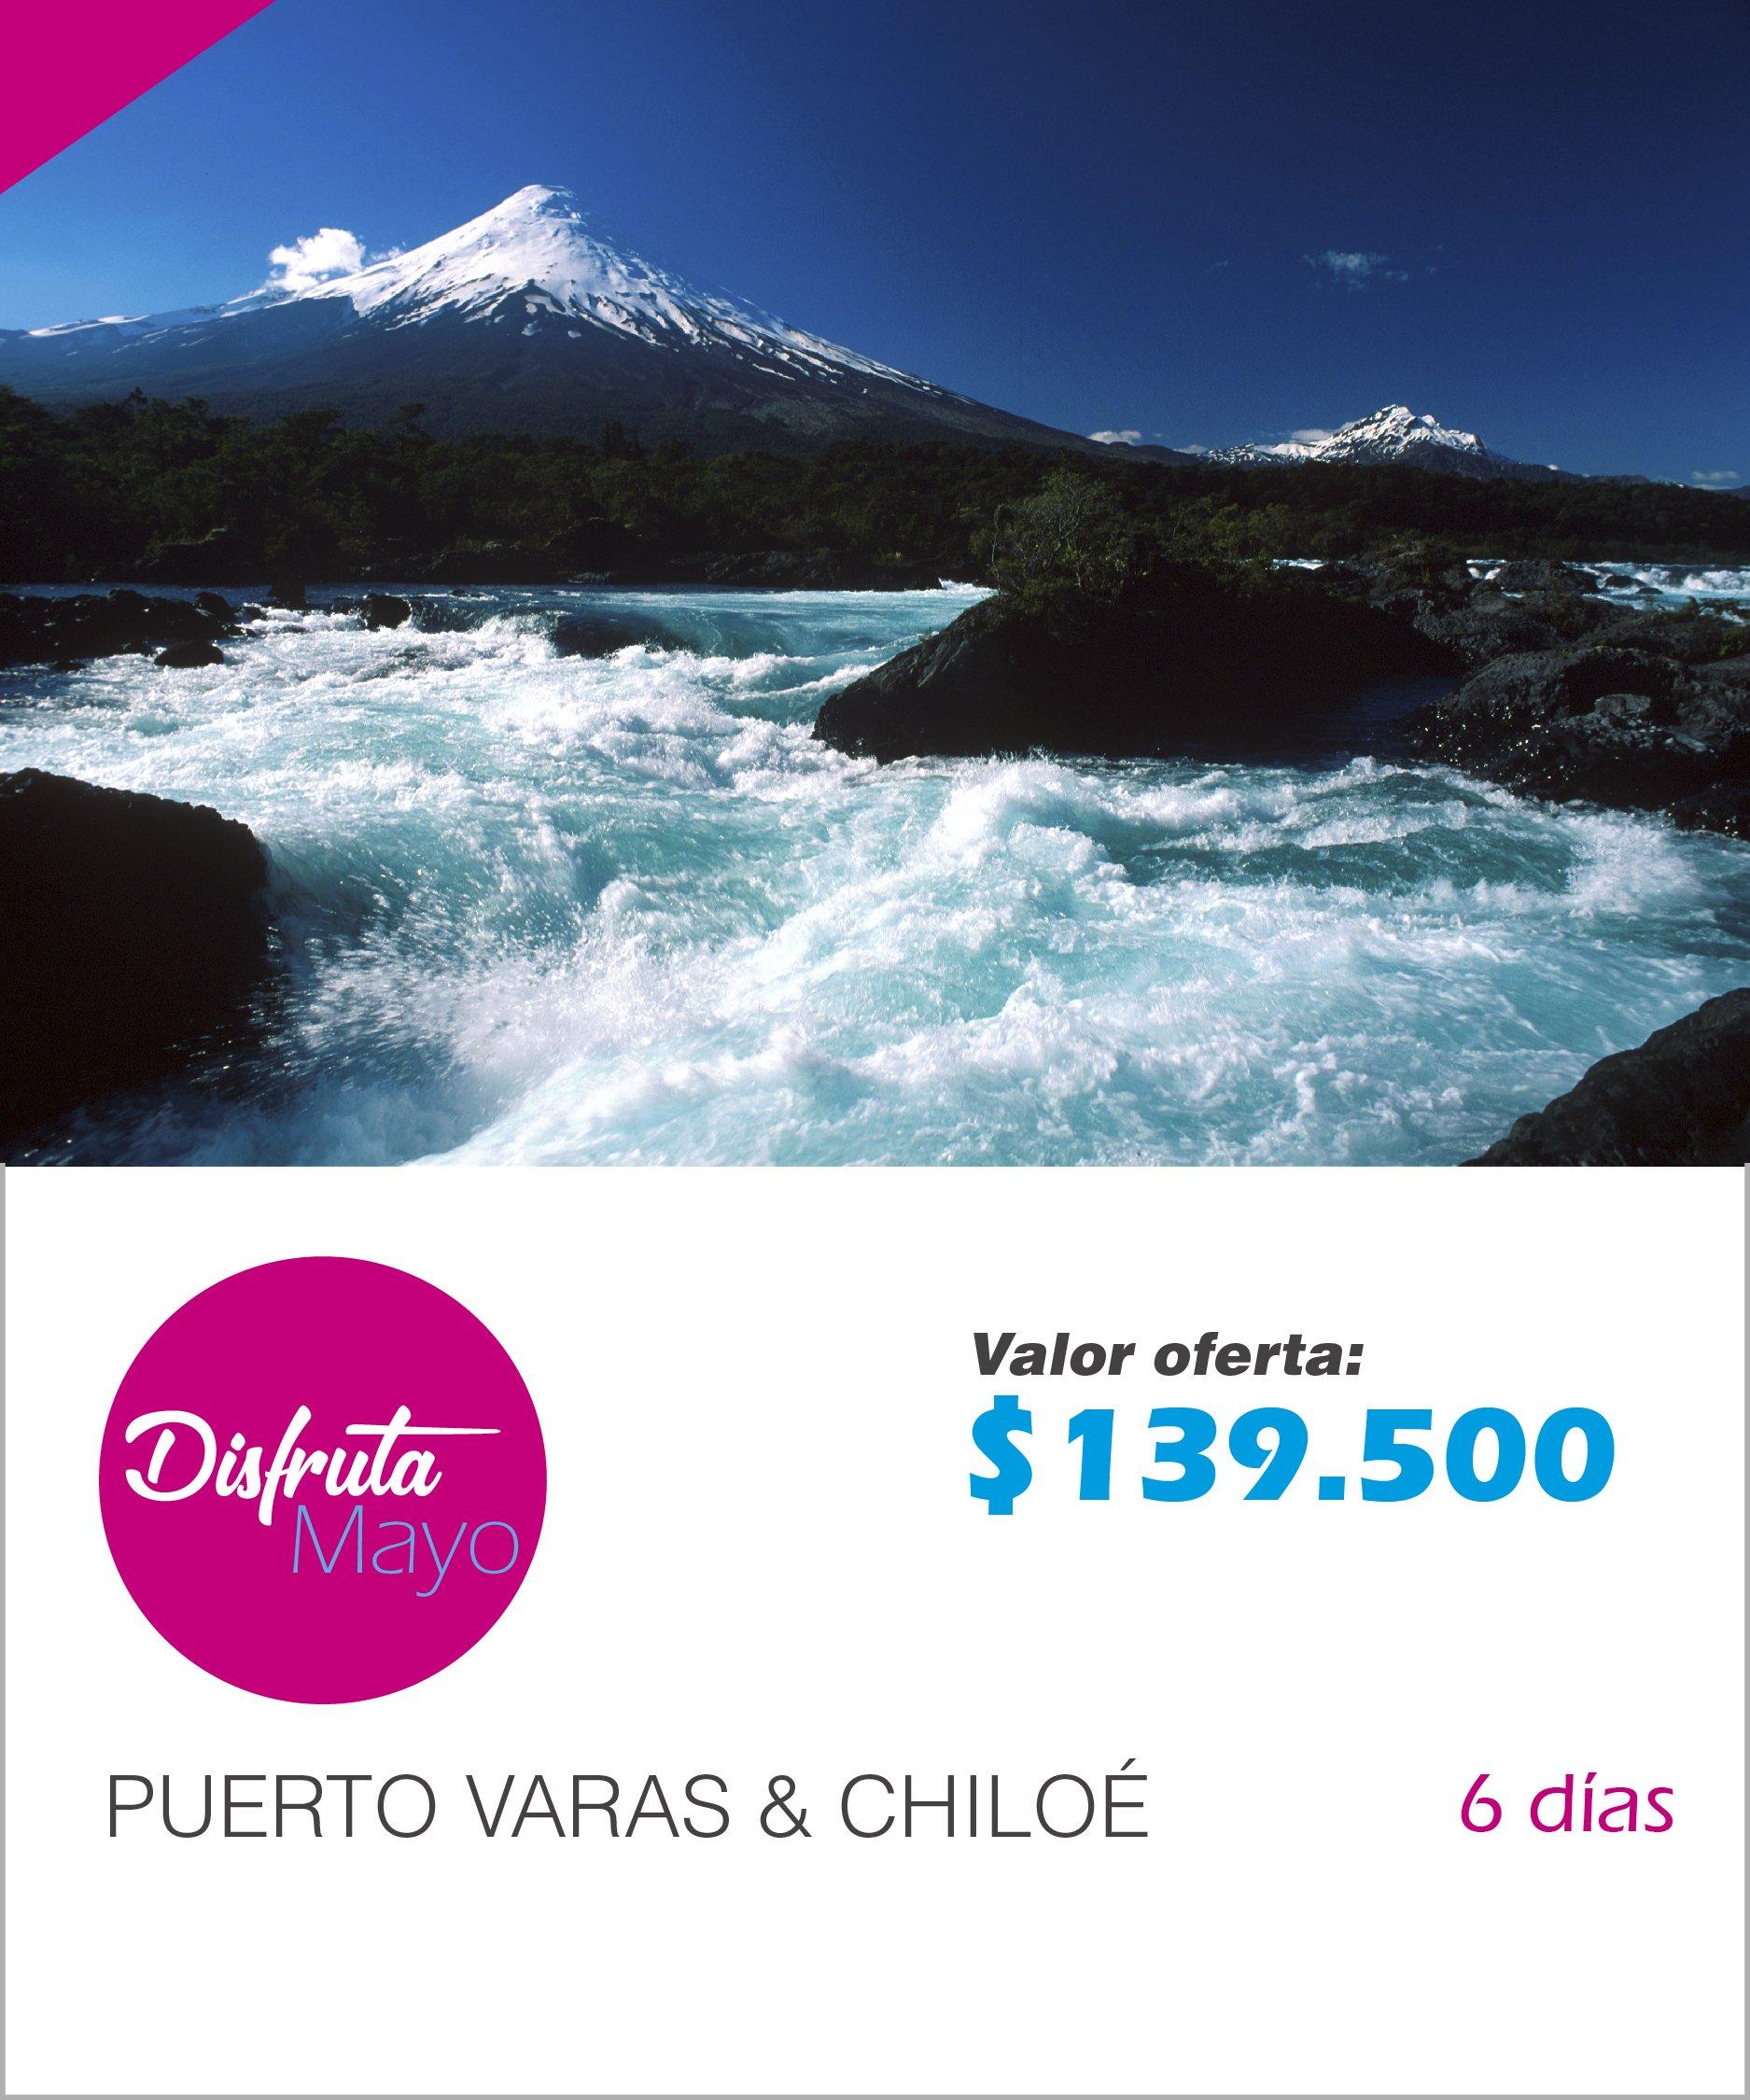 PUERTO VARAS & CHILOE